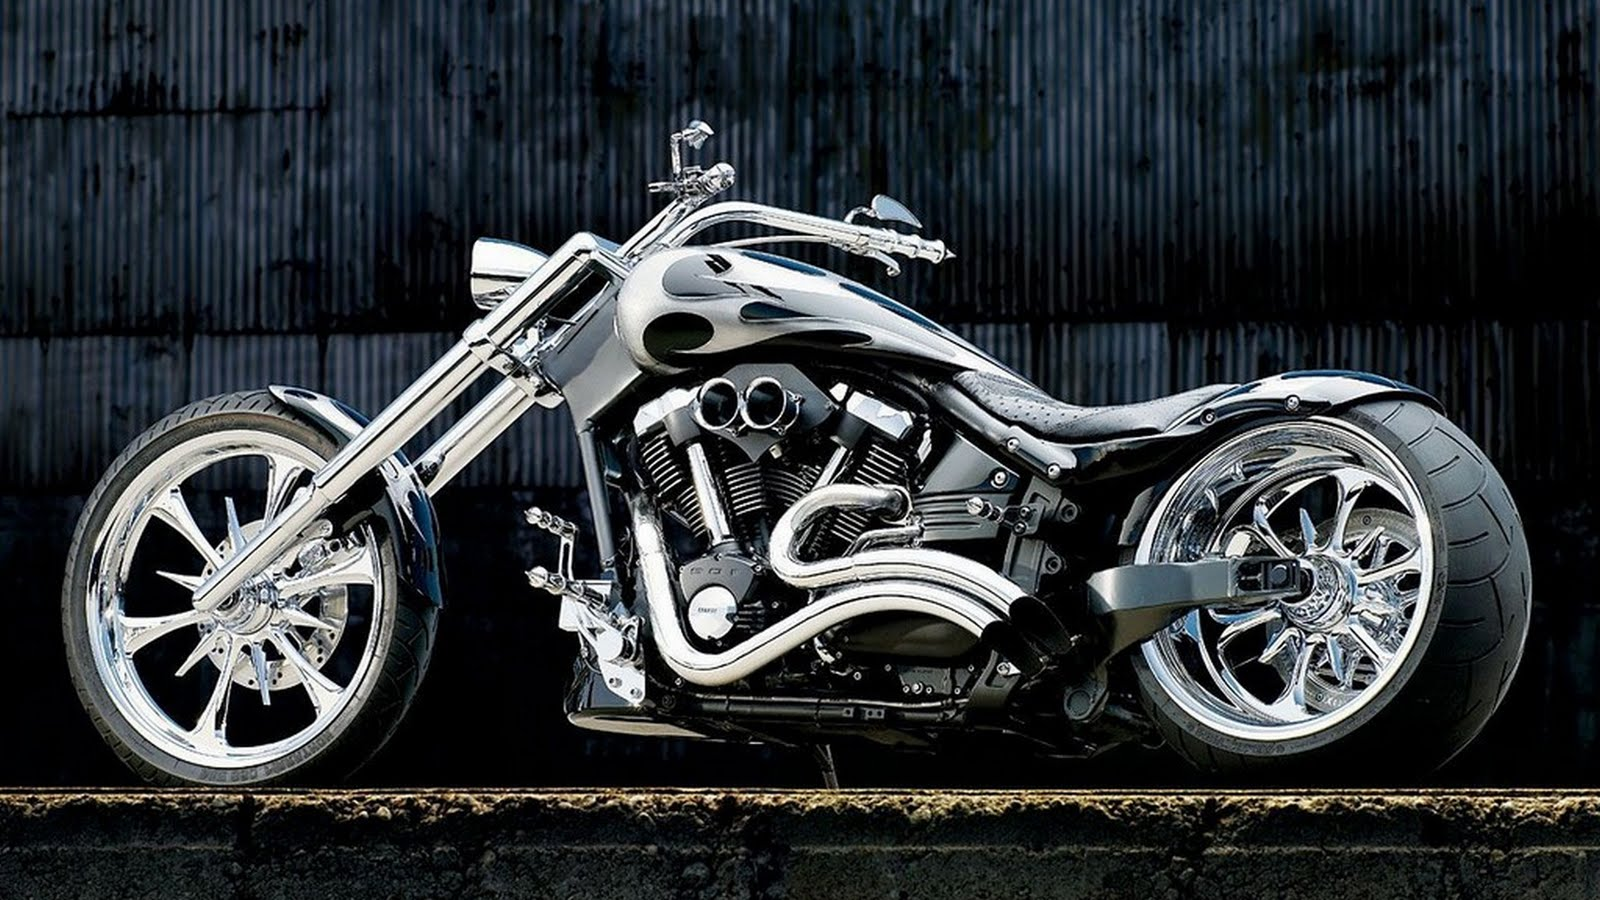 cruiser motorcycle wallpaper hd - photo #32